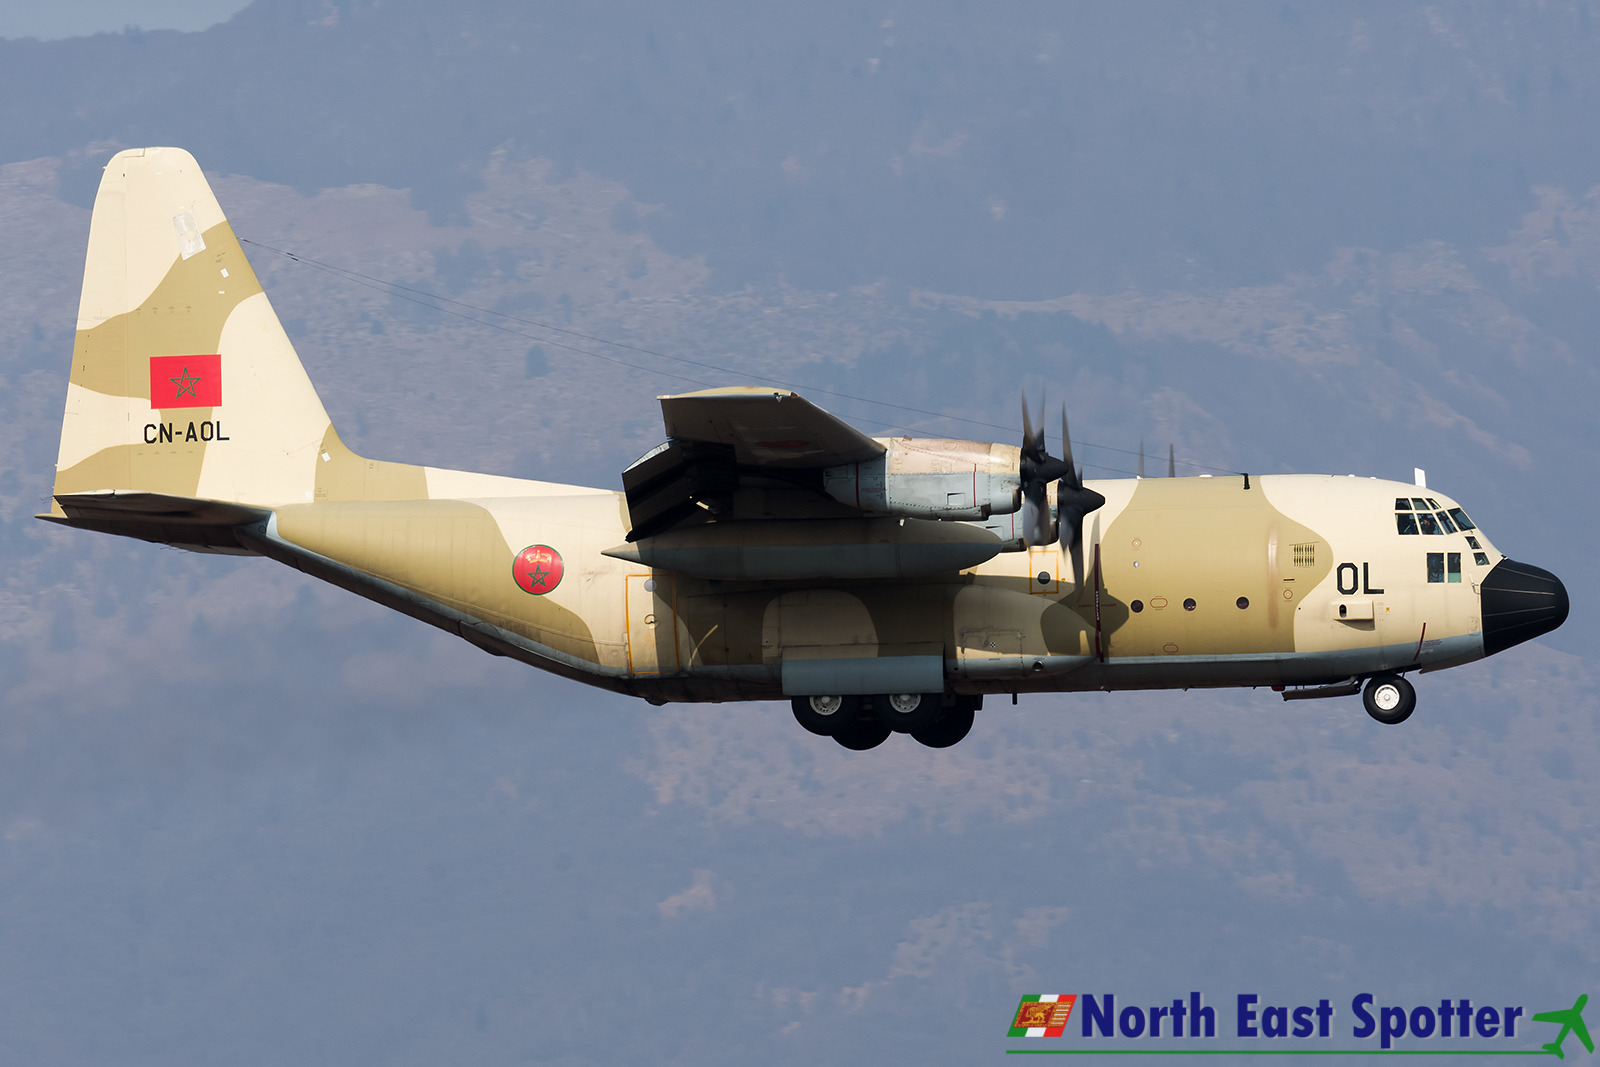 FRA: Photos d'avions de transport - Page 37 CN-AOL_AVB_16-03-19